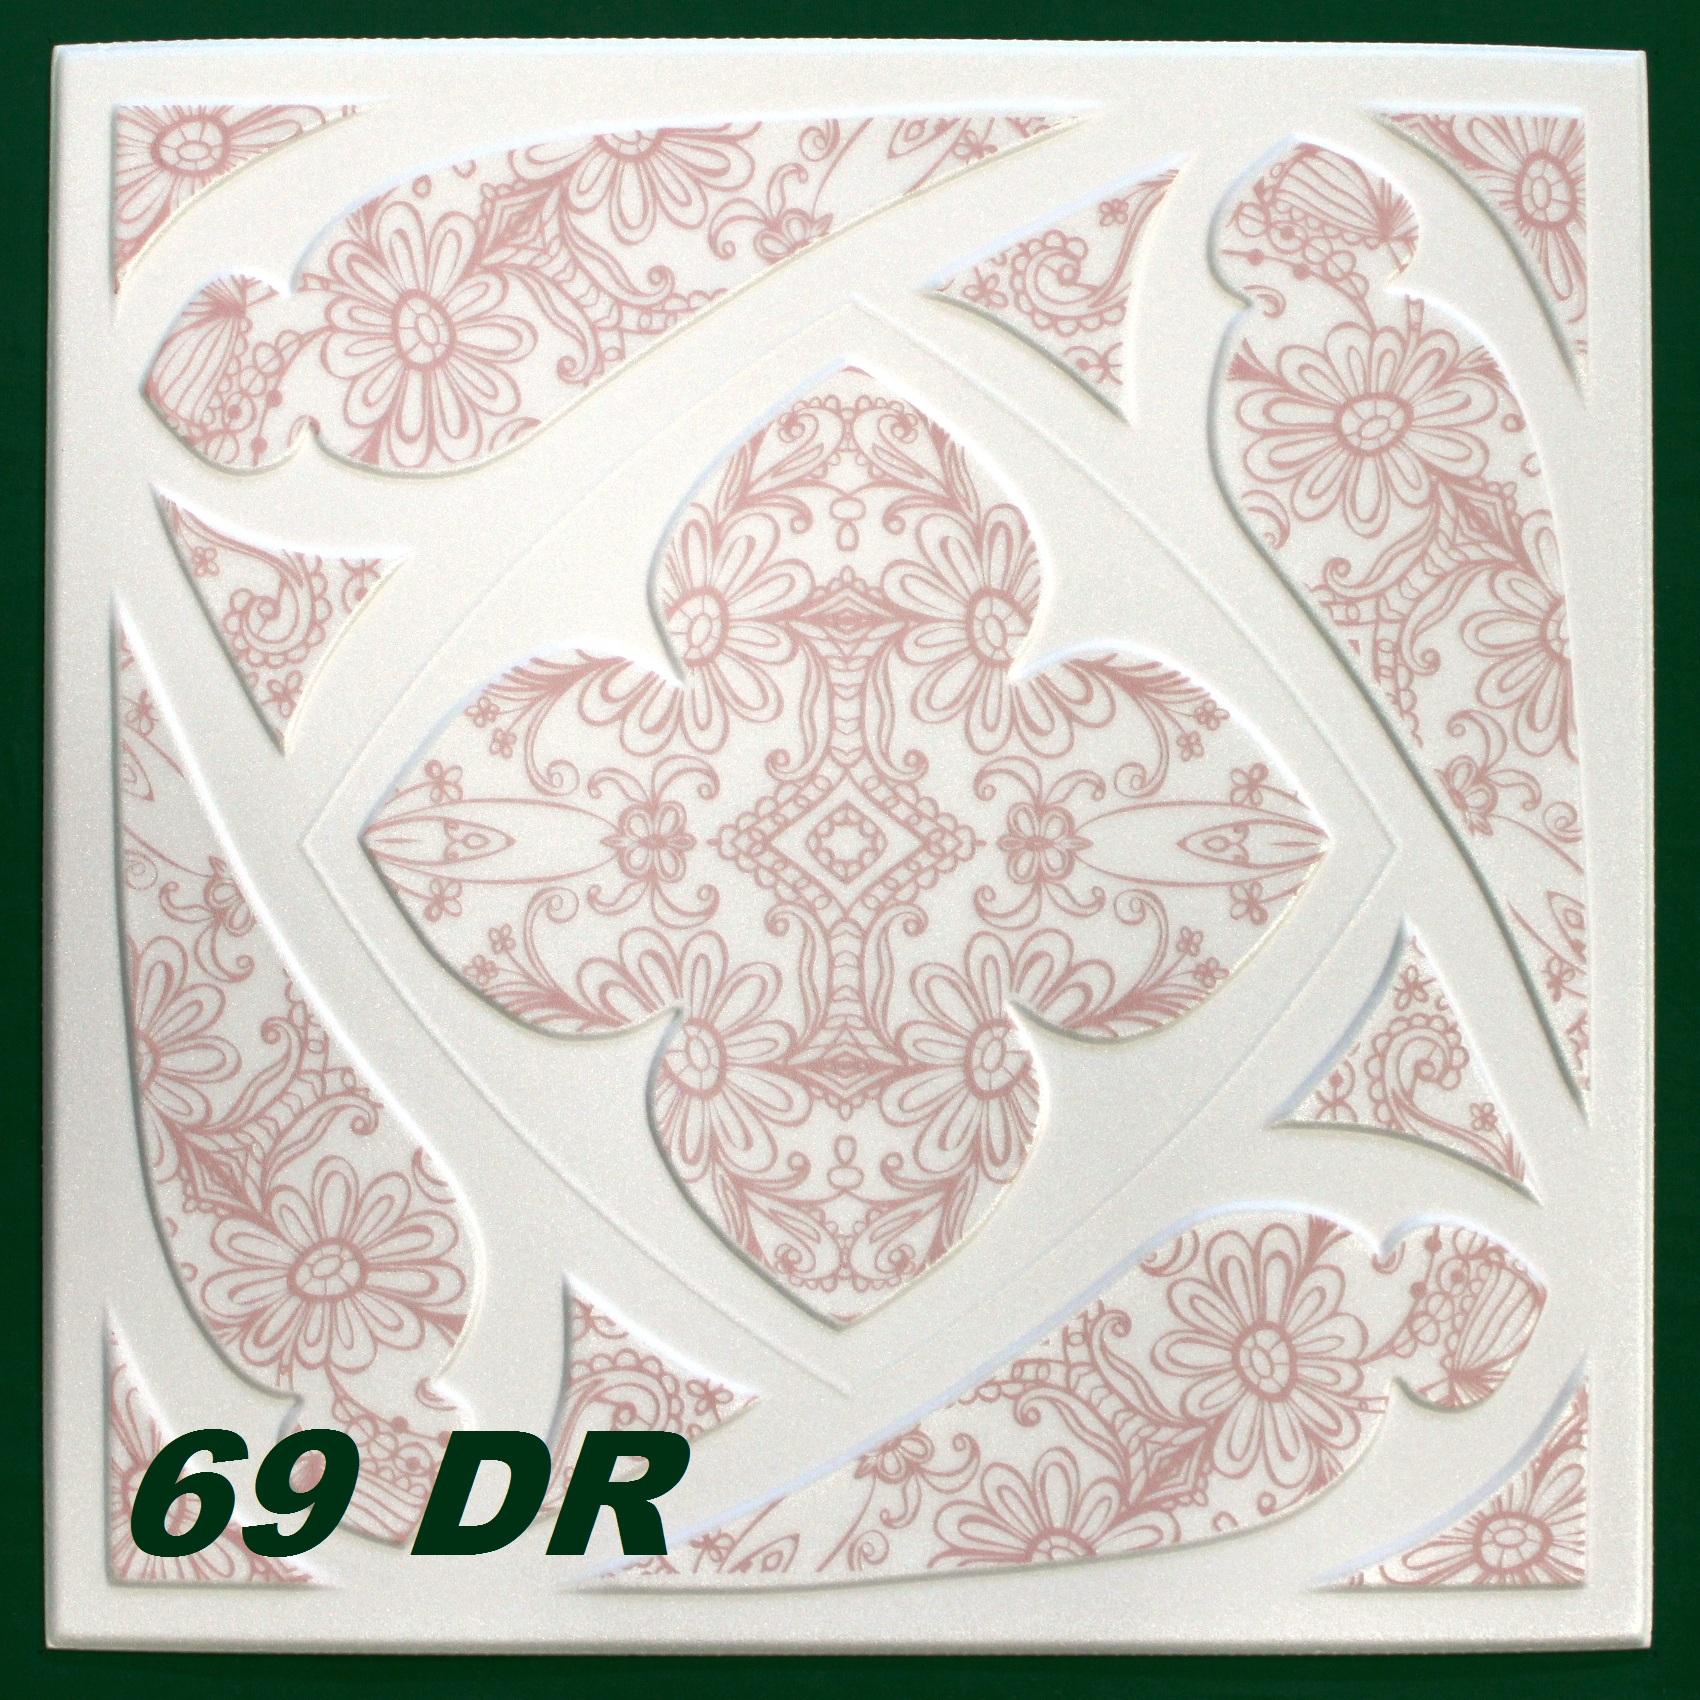 1 m2 deckenplatten styroporplatten stuck farbige platten 50x50cm dr ebay. Black Bedroom Furniture Sets. Home Design Ideas